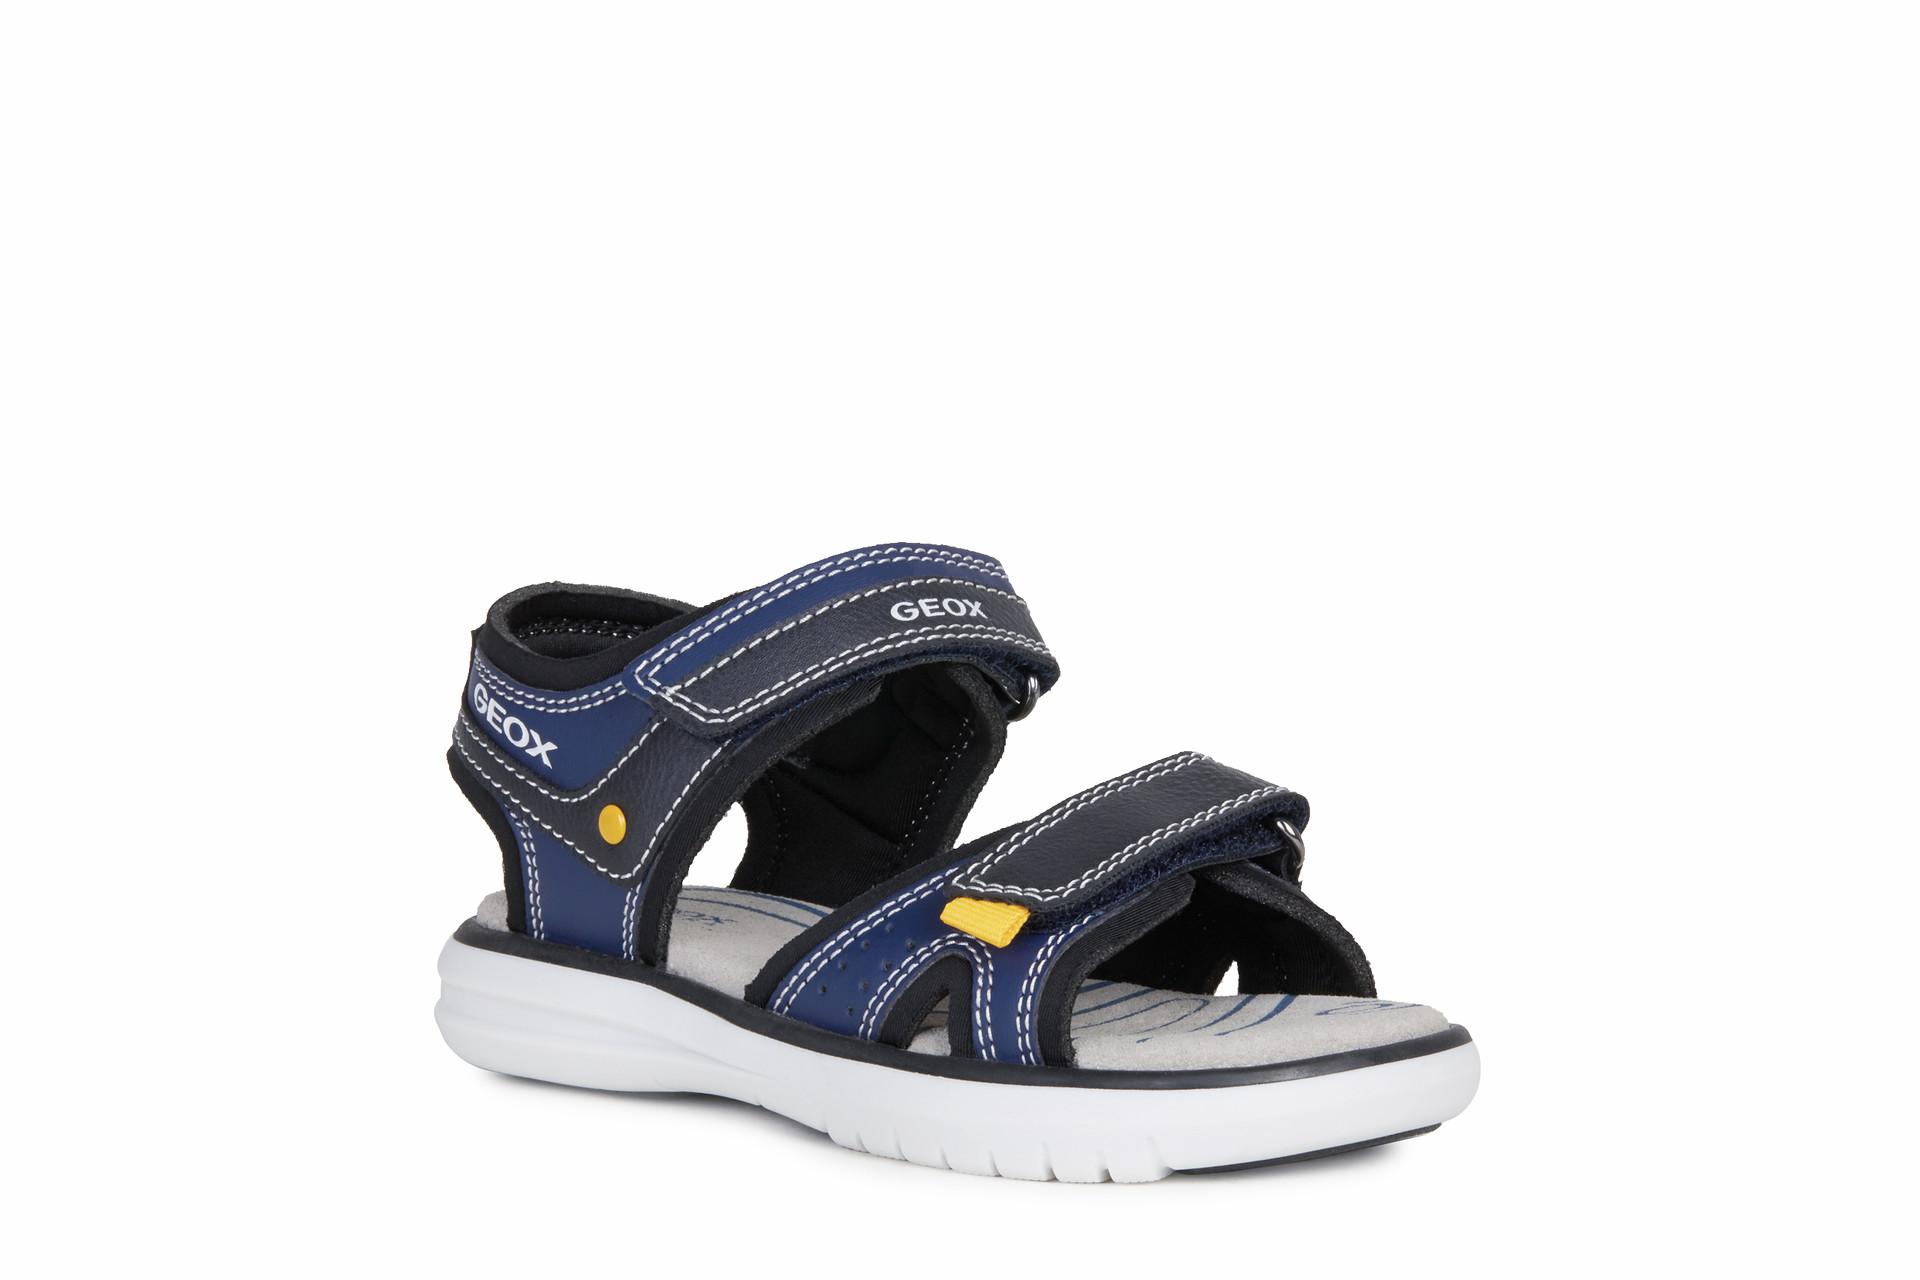 Sandale pour garçon Geox Maratea J15DRA C0567 navy/yellow